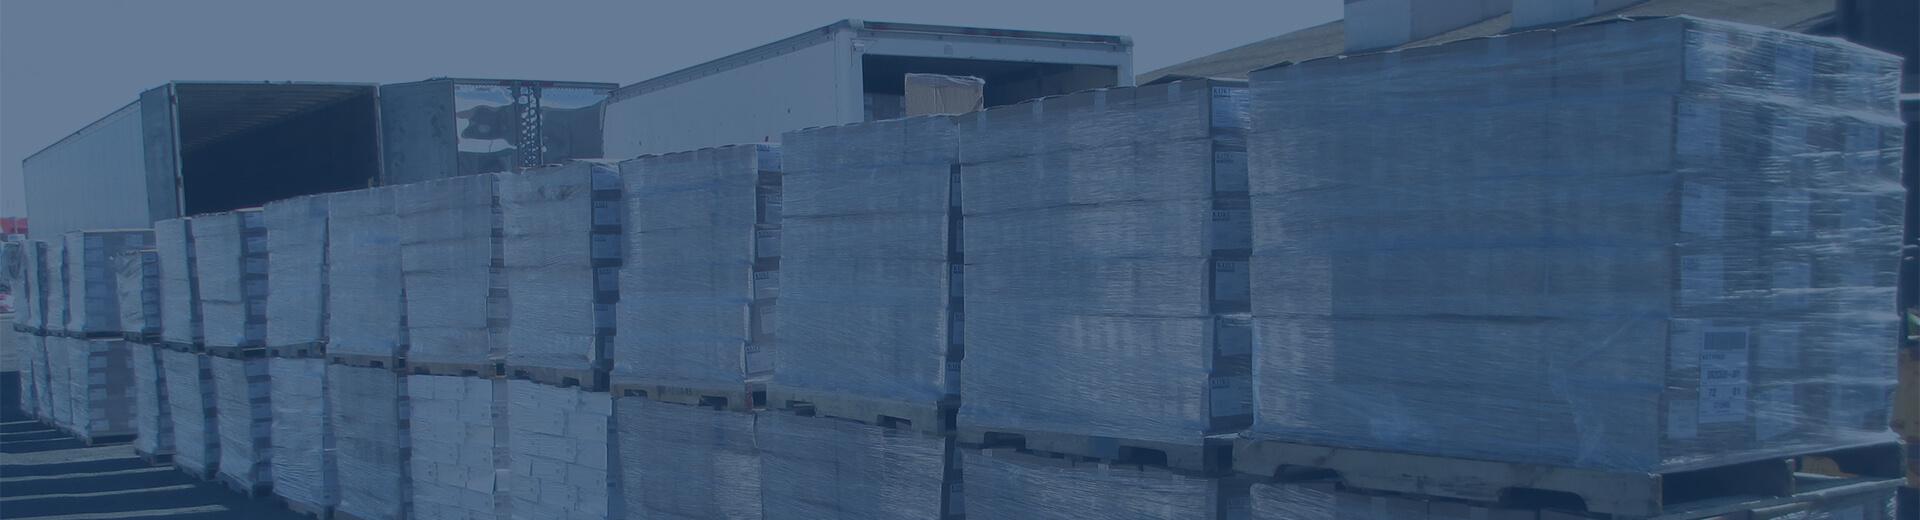 Hazardous debris bags ready for shipment